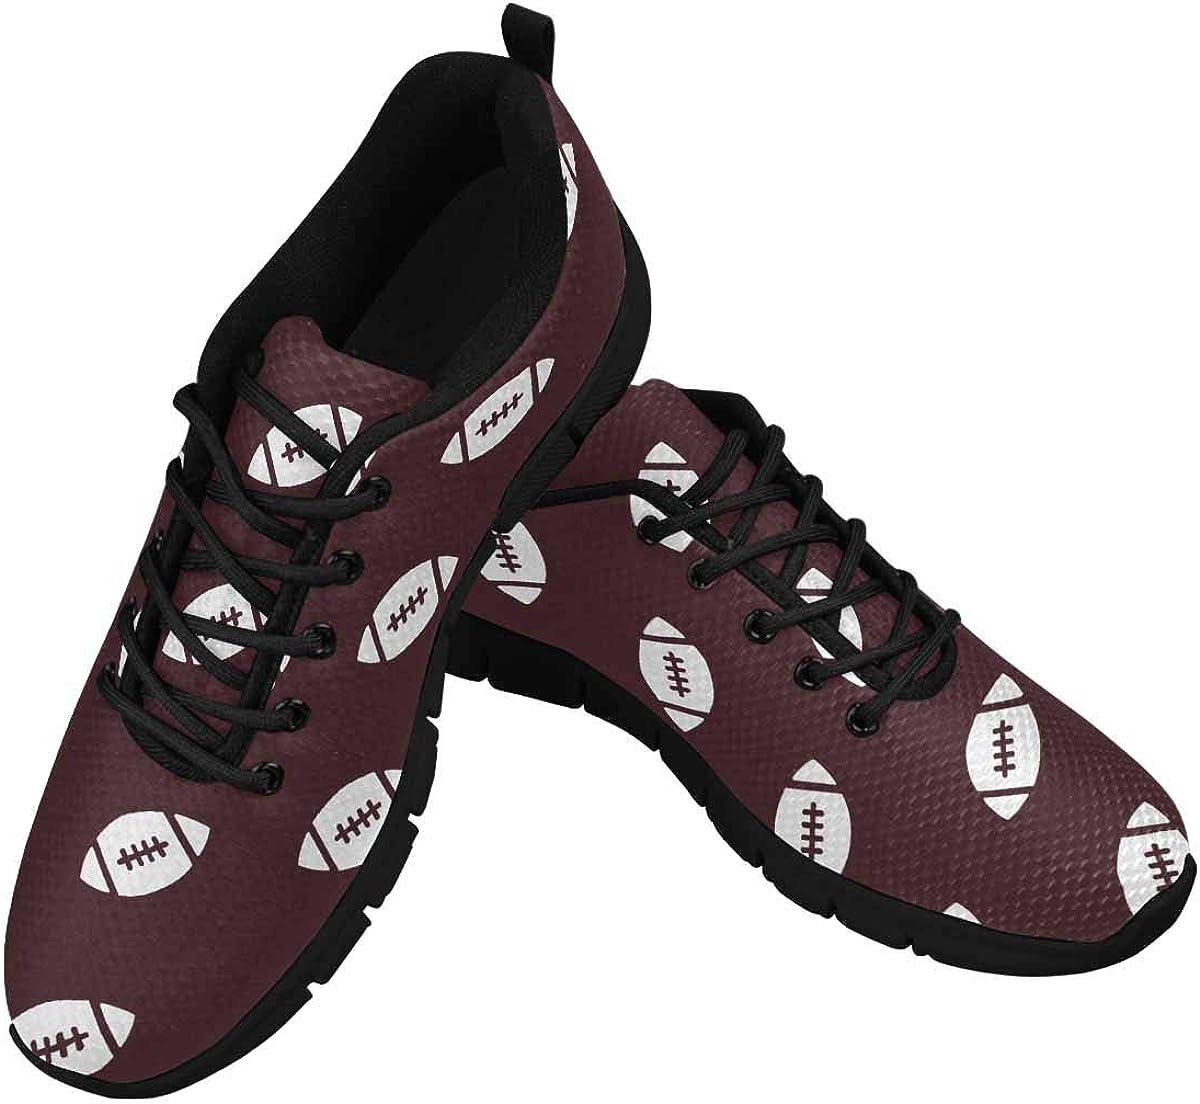 InterestPrint American Football Chocolate Women's Athletic Walking Shoes Comfort Mesh Non Slip